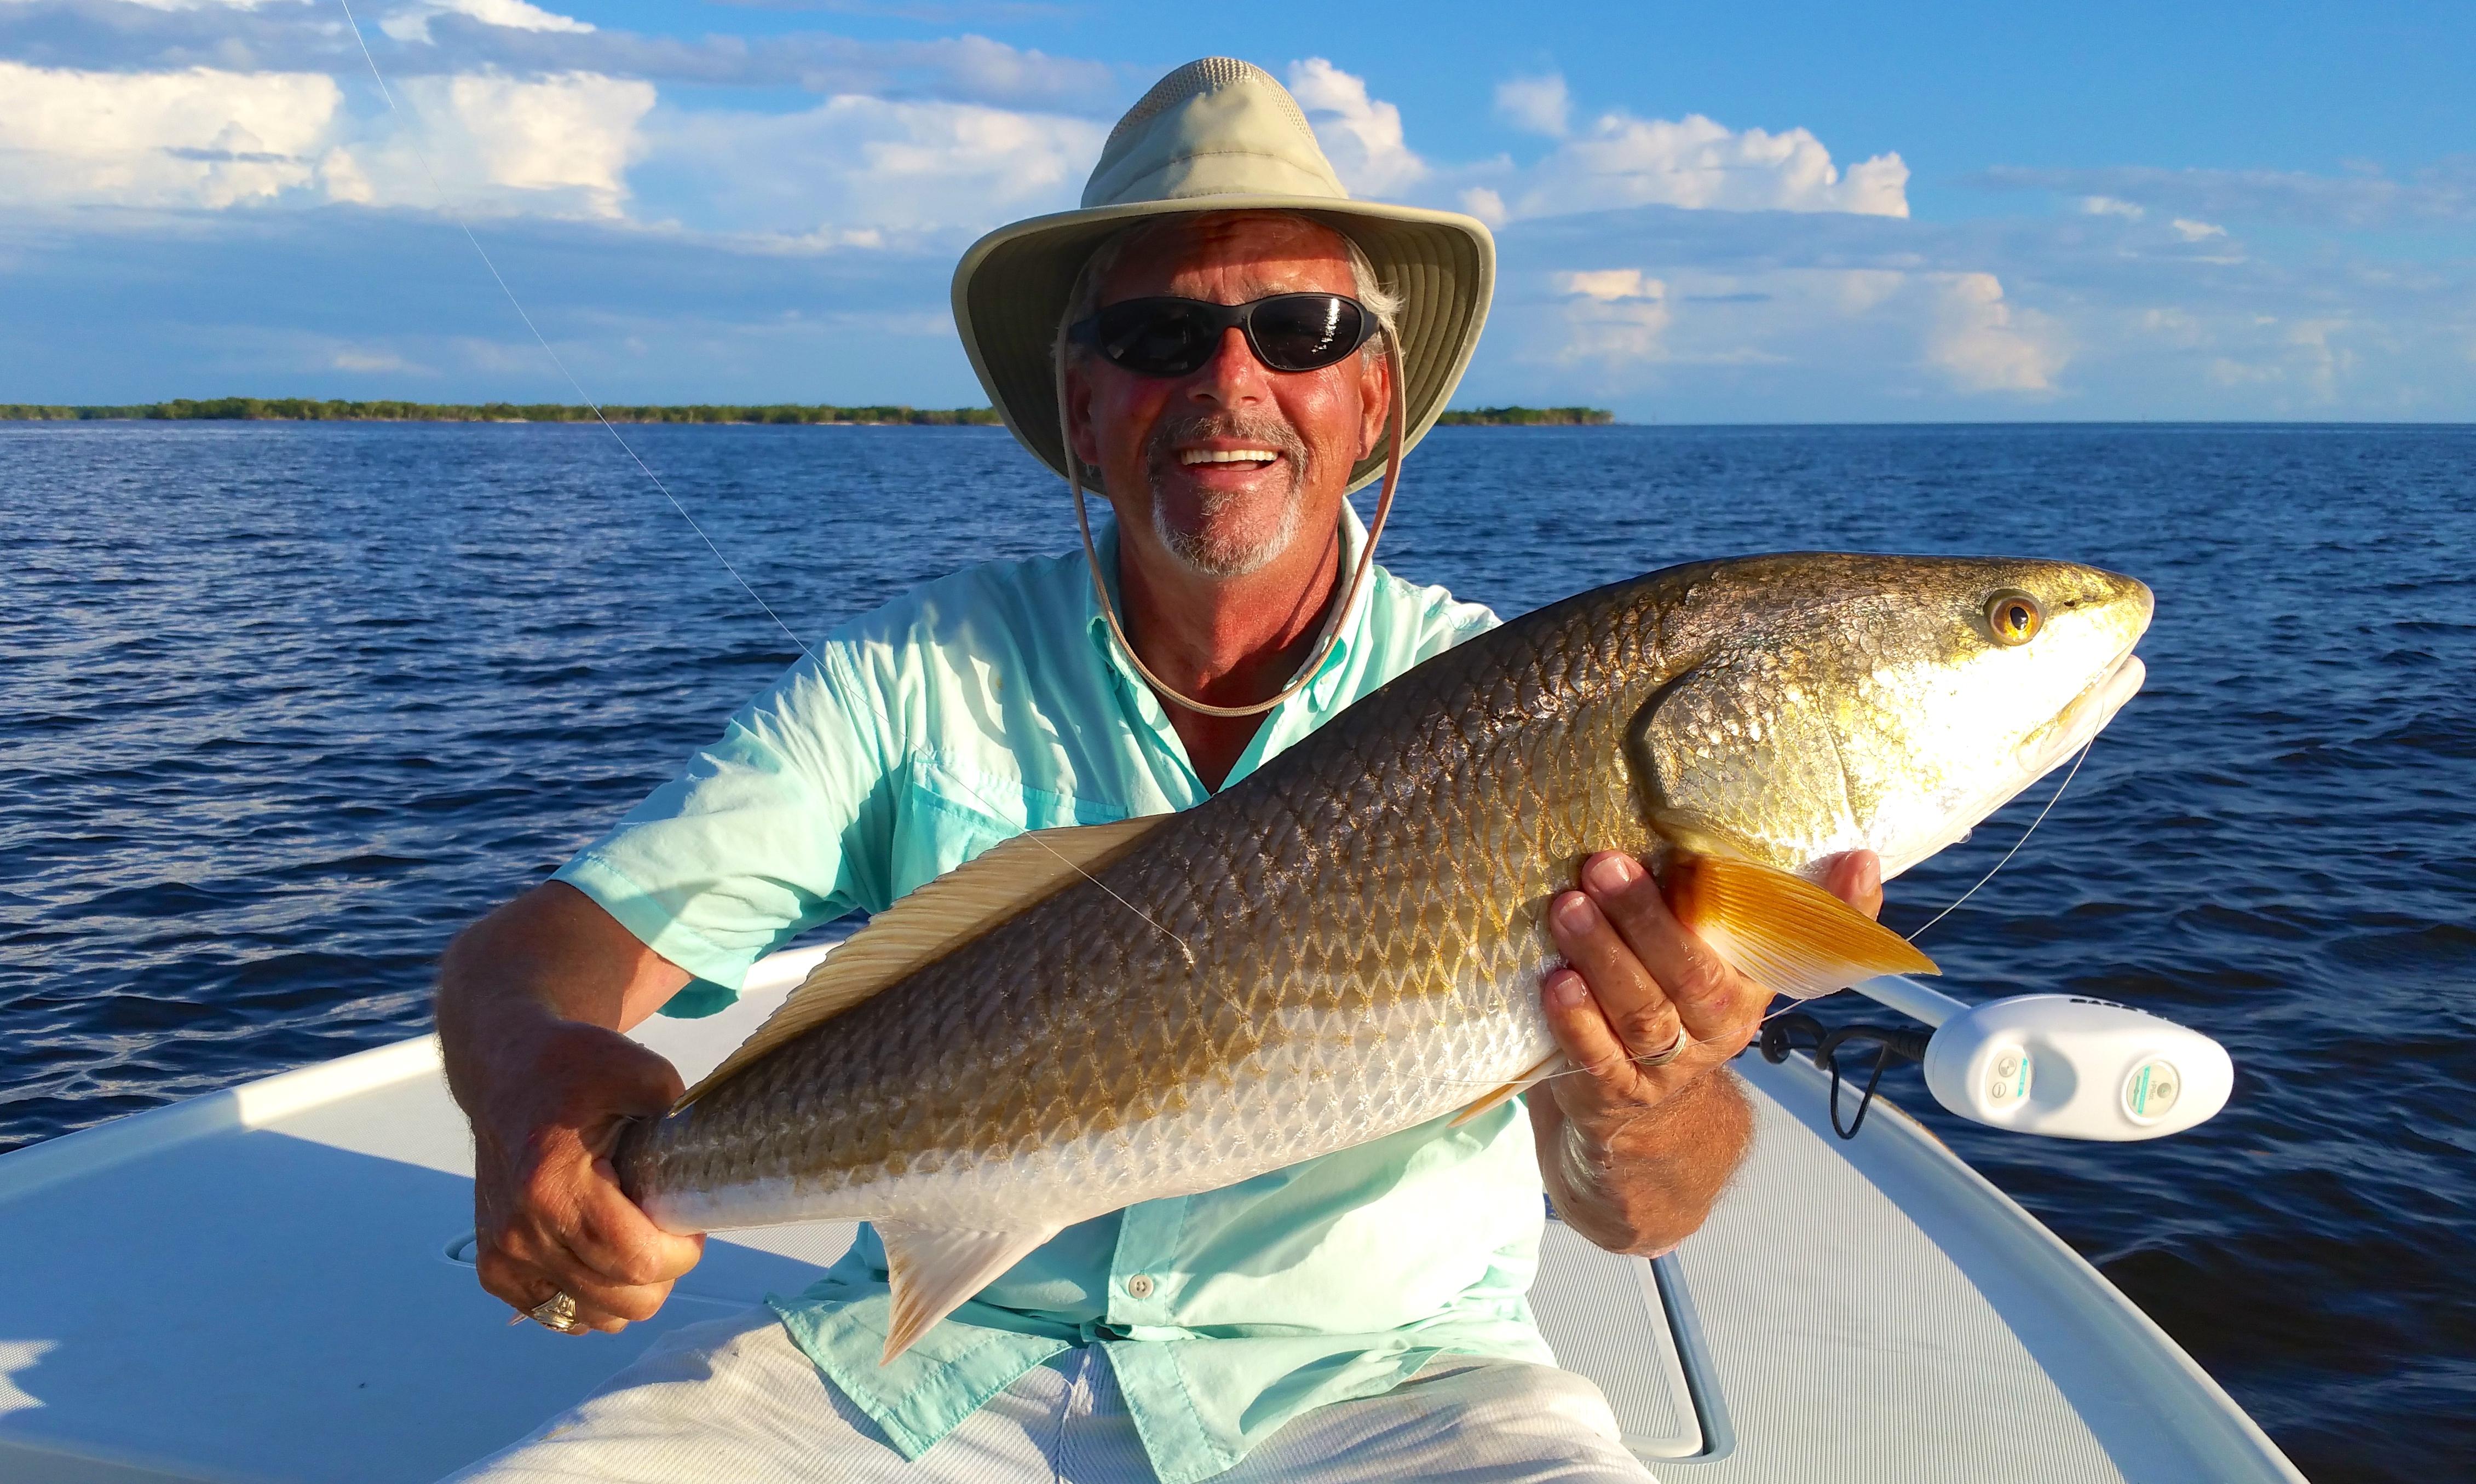 Charles with Everglades Redfish